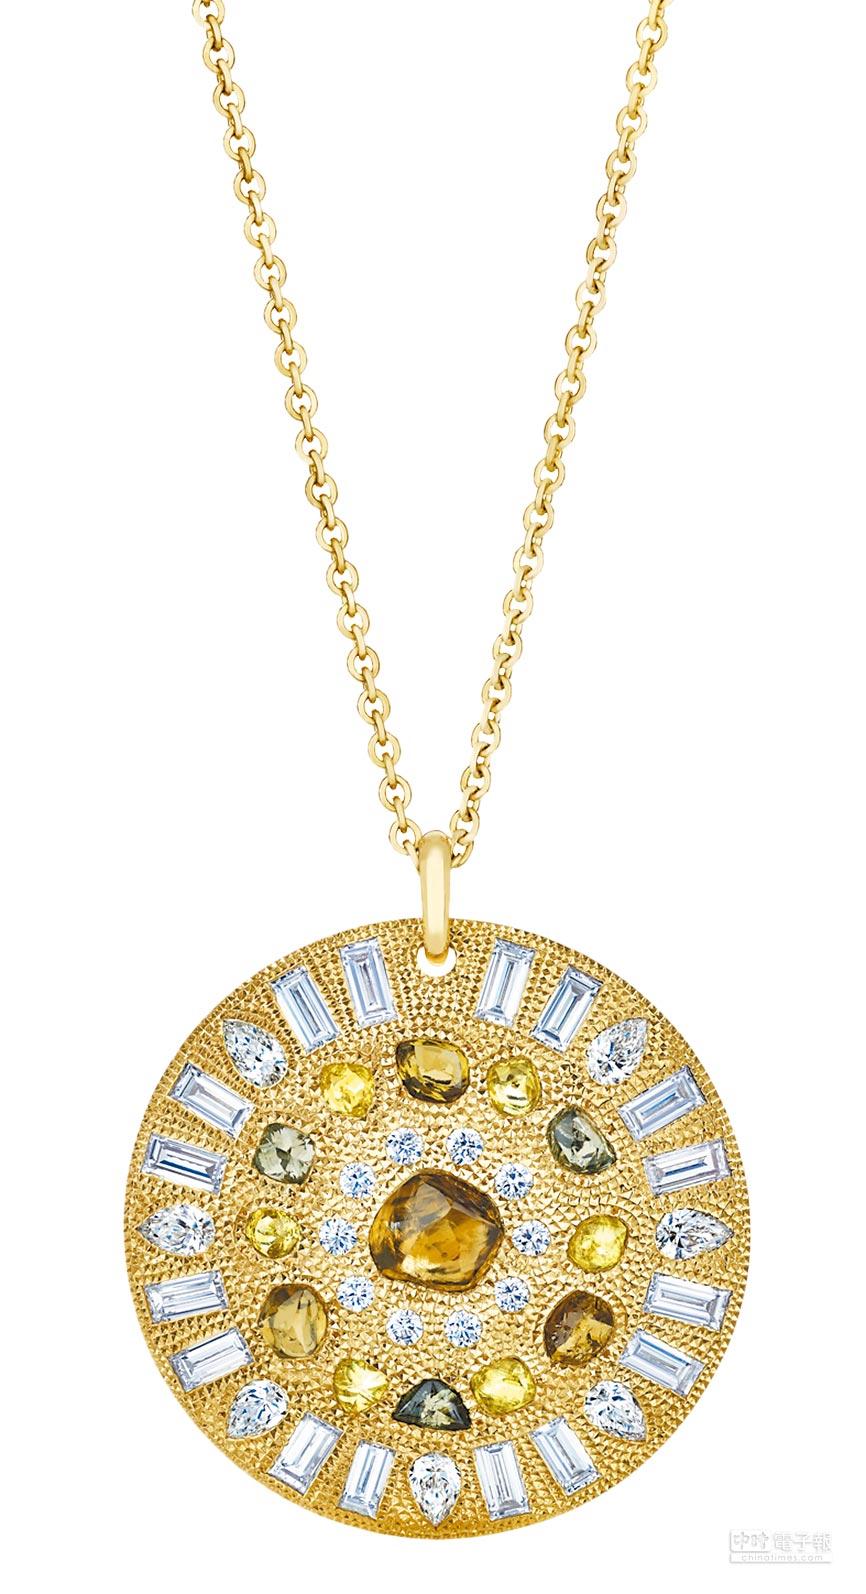 De Beers Talisman Four Seasons系列夏季圓盤鍊墜,黃K金底座,鑲嵌鑽石原石與拋光鑽石並列鑲嵌,中央主鑽2.57克拉,192萬5000元。(De Beers提供)